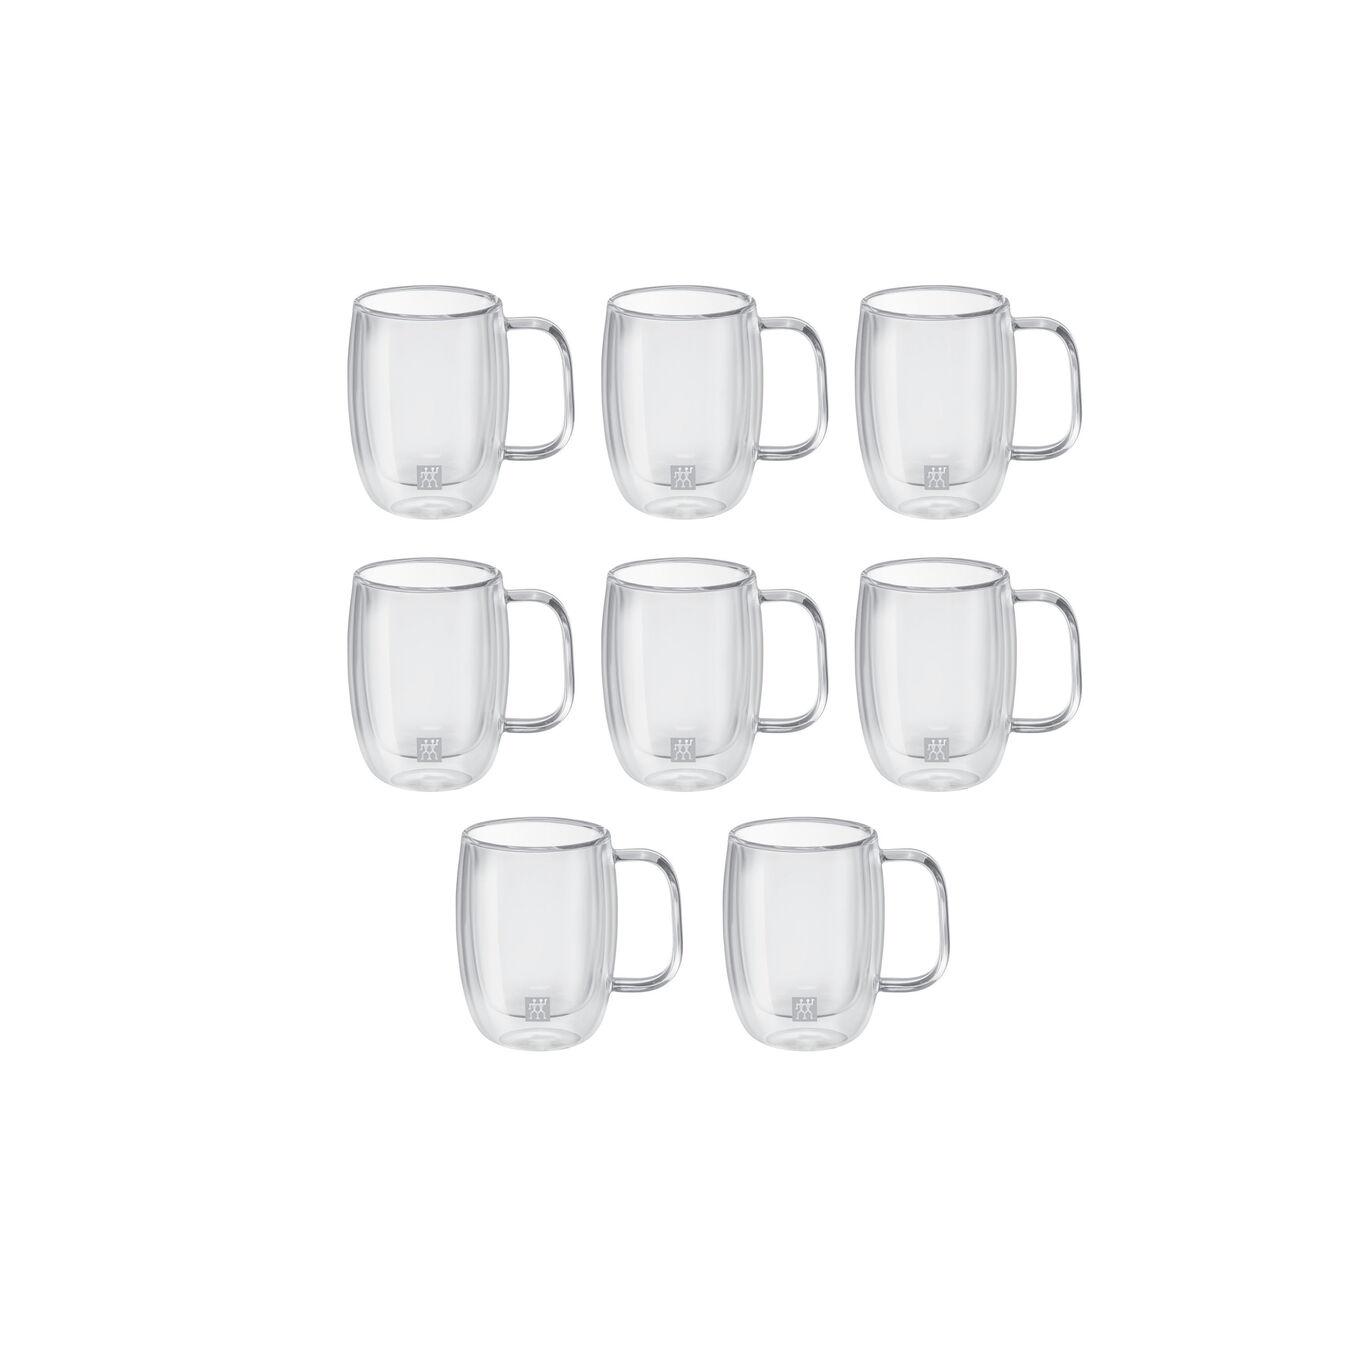 8 Piece Espresso glass set - Buy 6 Get 8,,large 1